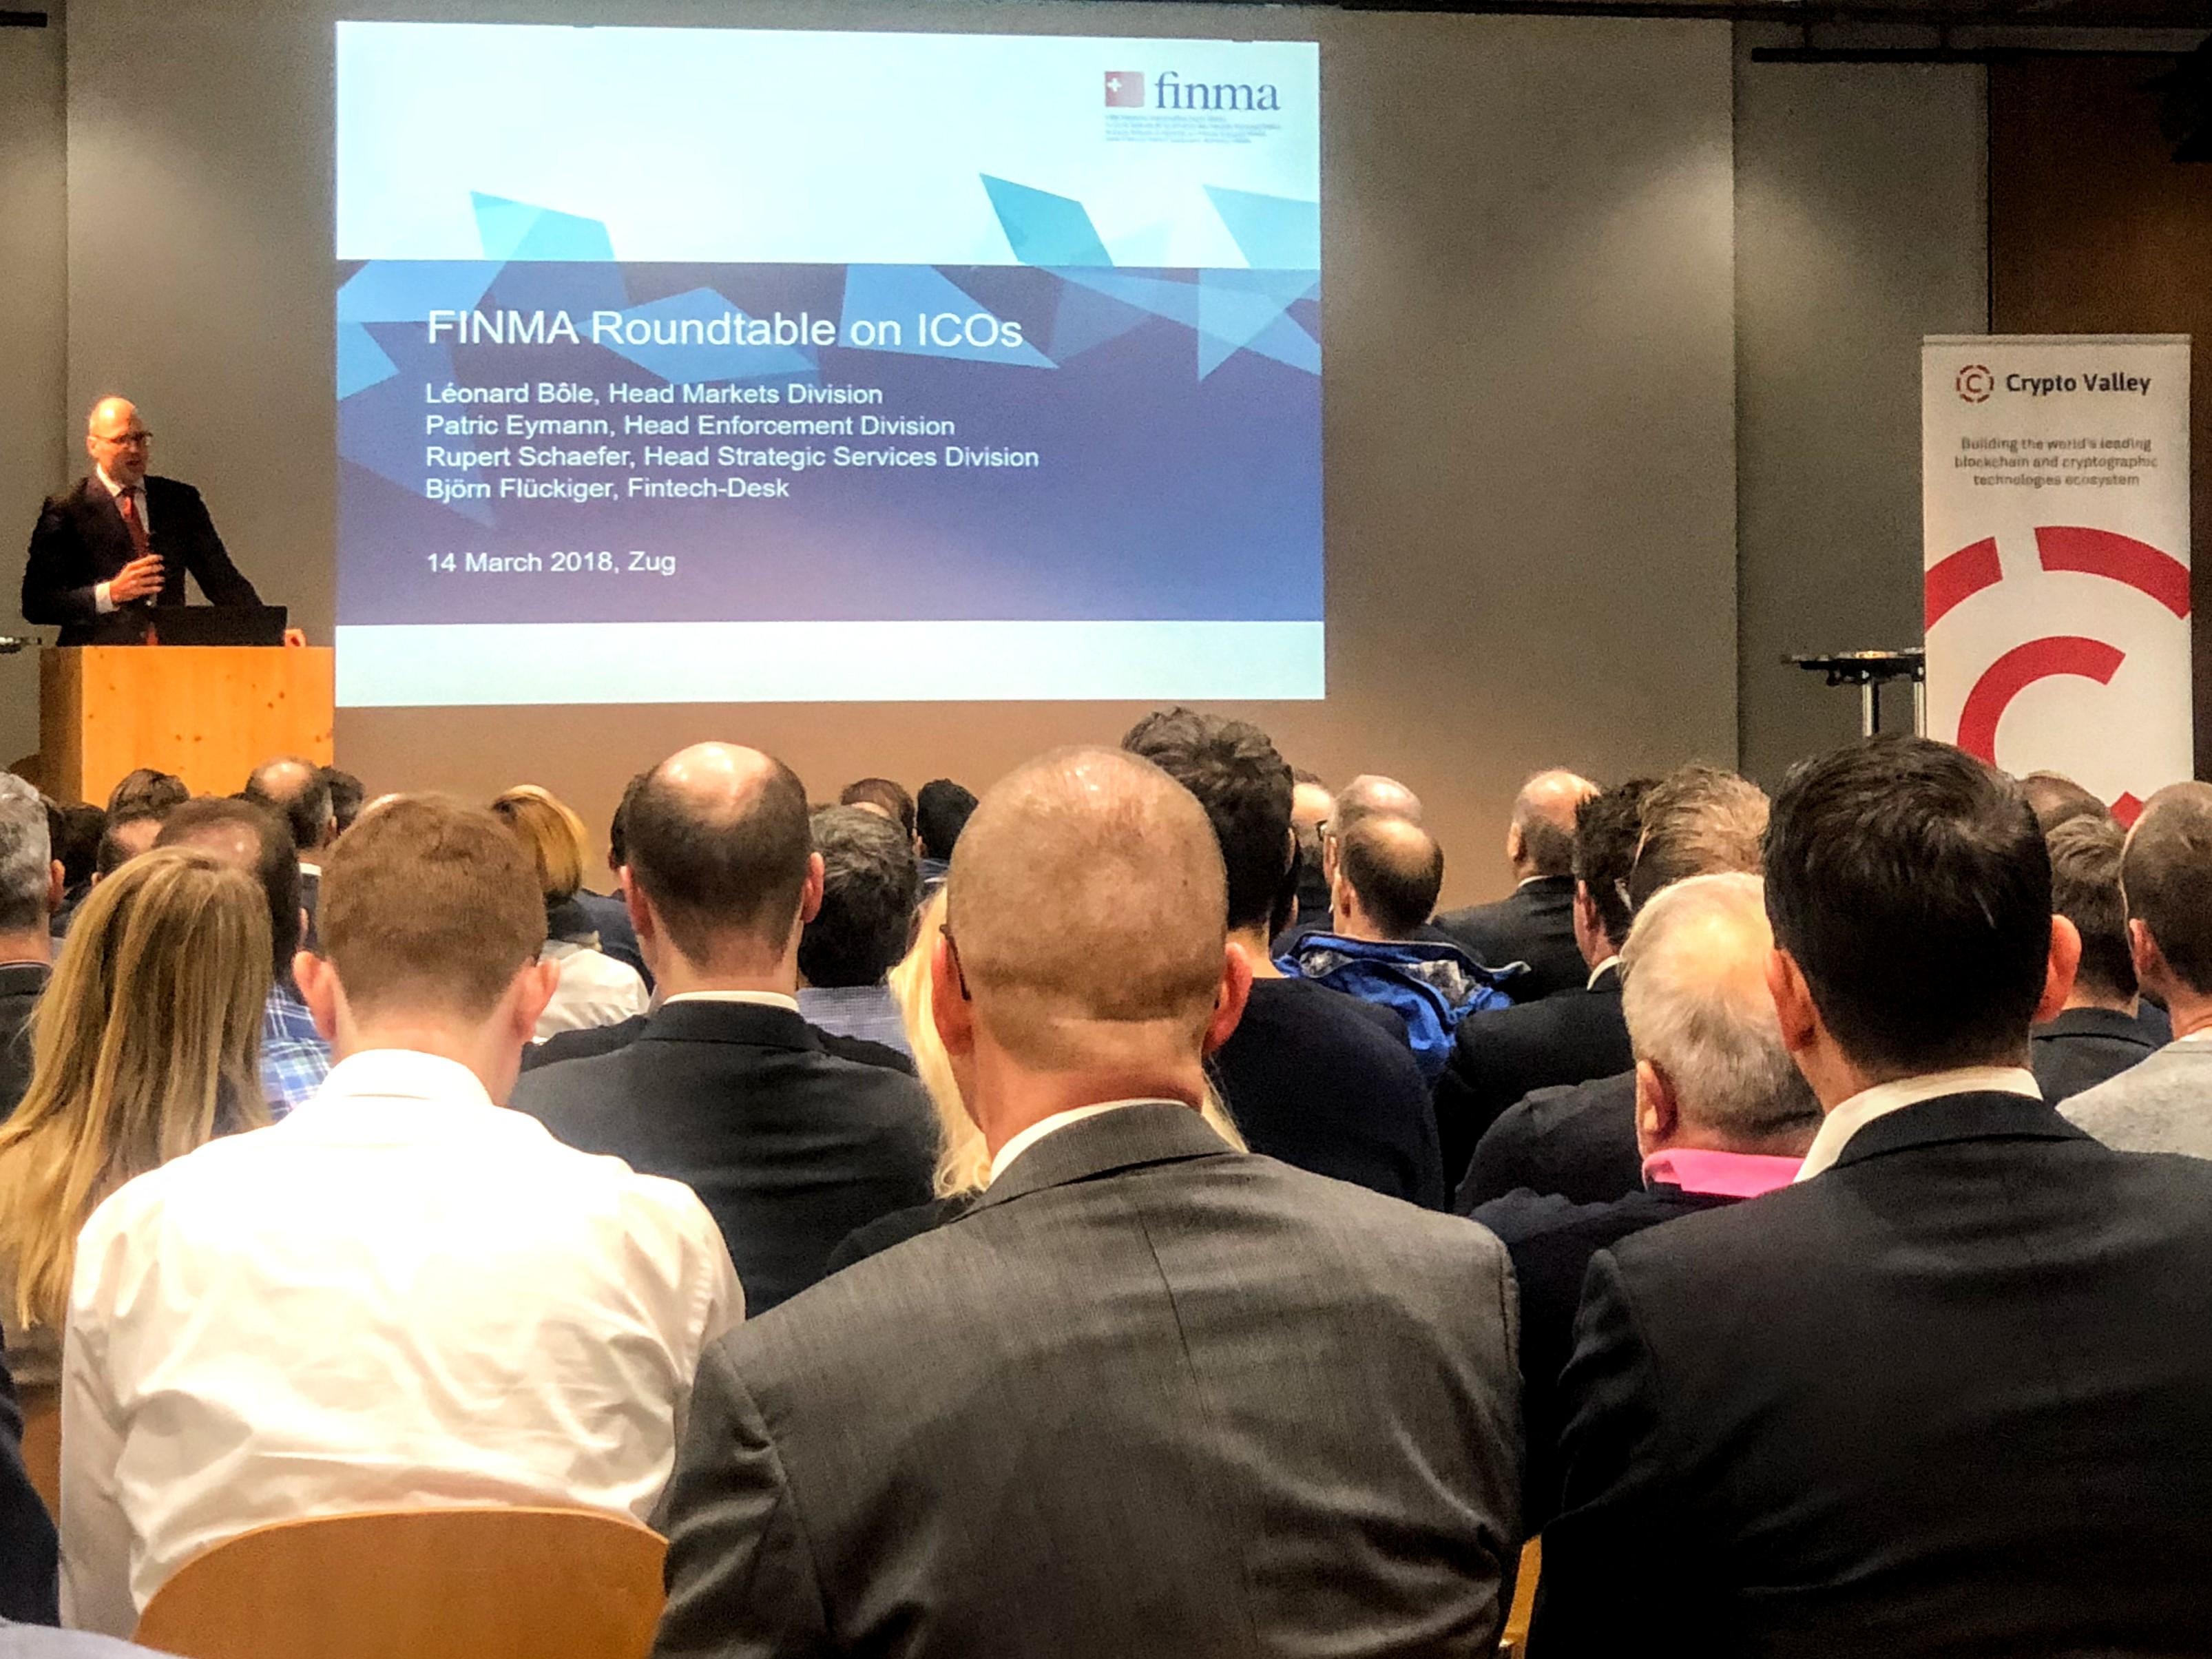 FINMA roundtable on ICOs - image by Boris Reinhard